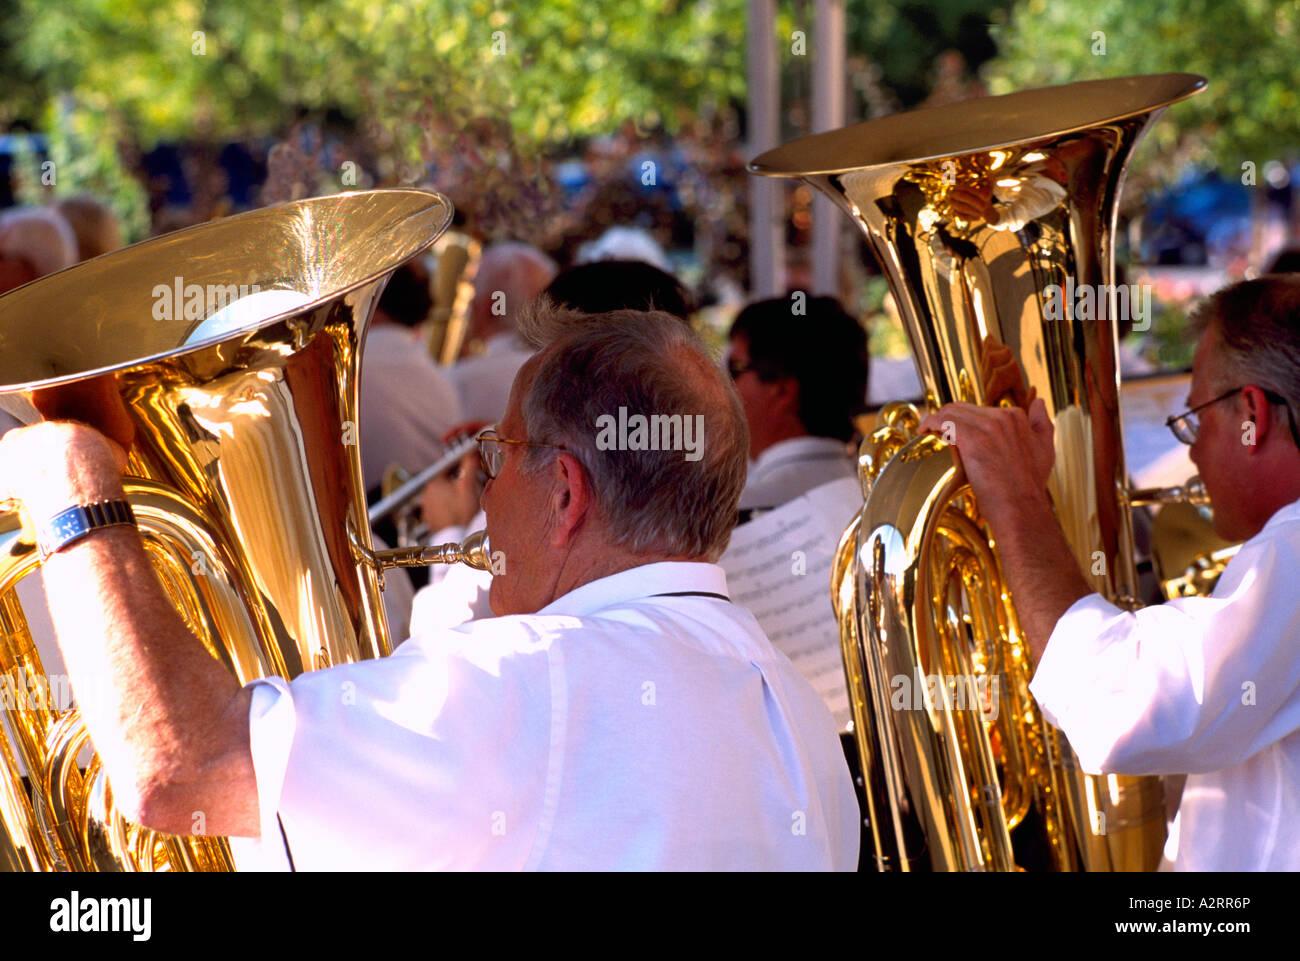 Senior Men playing Tubas in a Band Stock Photo